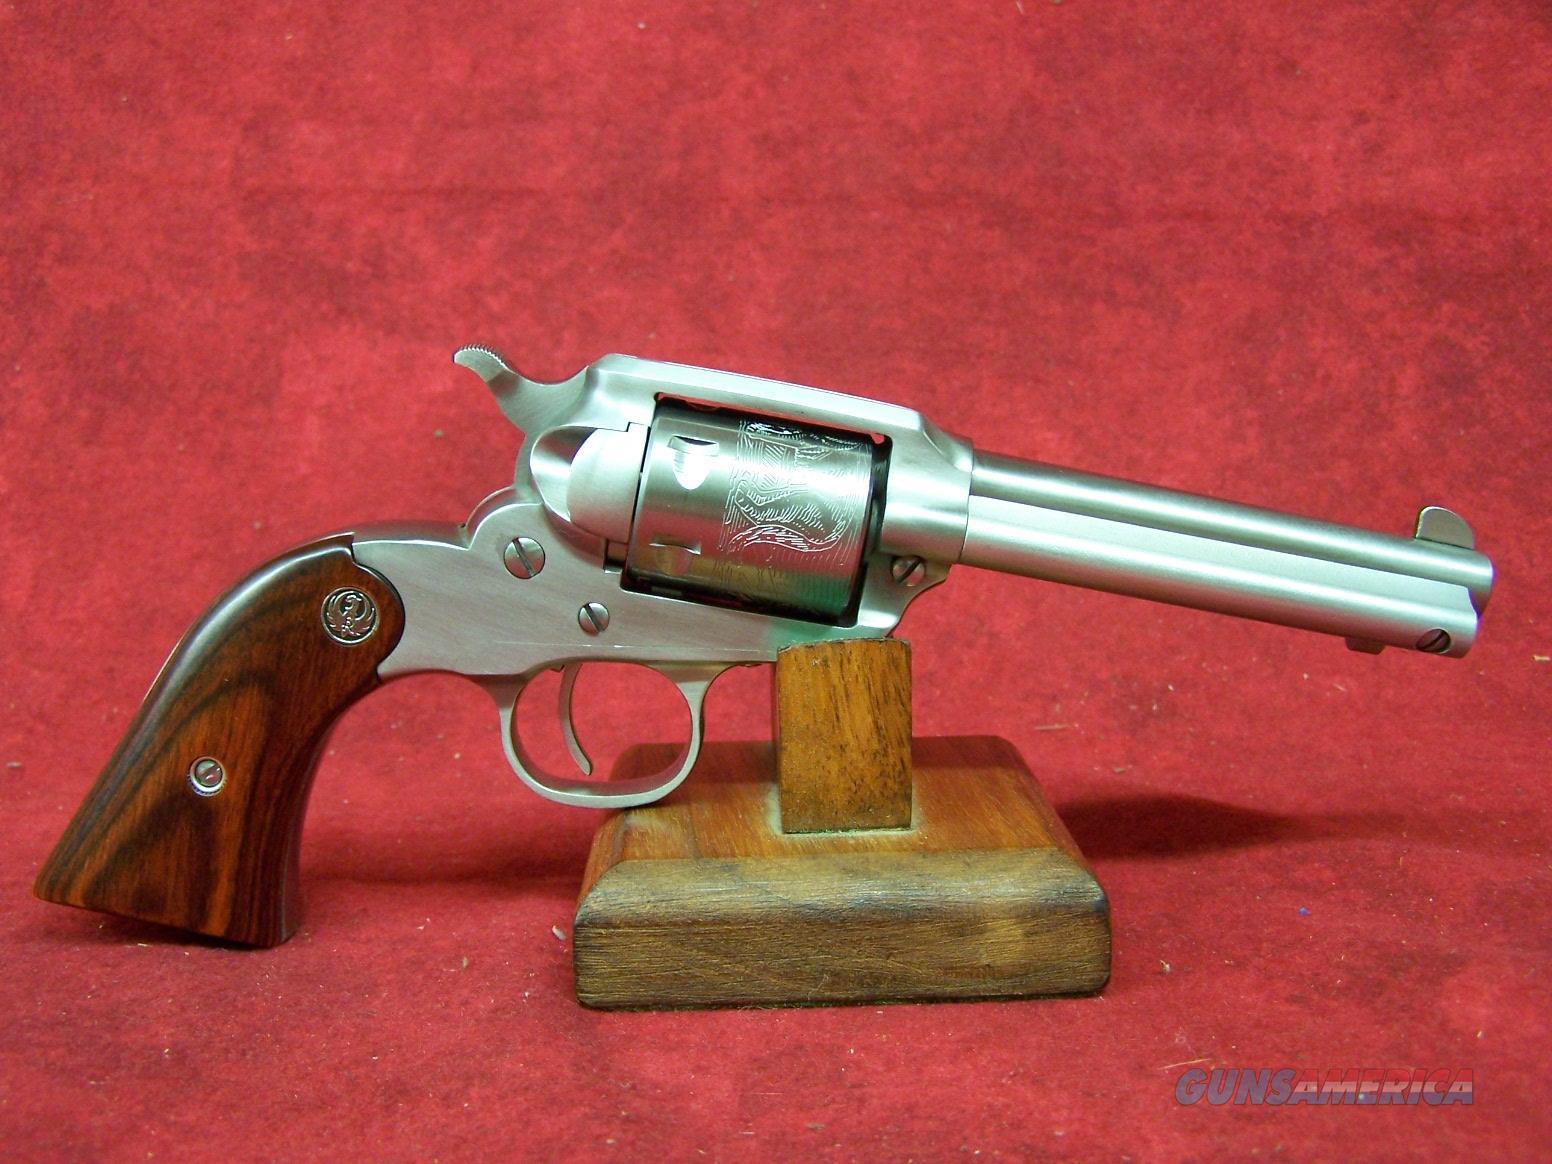 "Ruger Bearcat 22LR 4.2"" Barrel Wood Grips  Guns > Pistols > Ruger Single Action Revolvers > Bearcat"